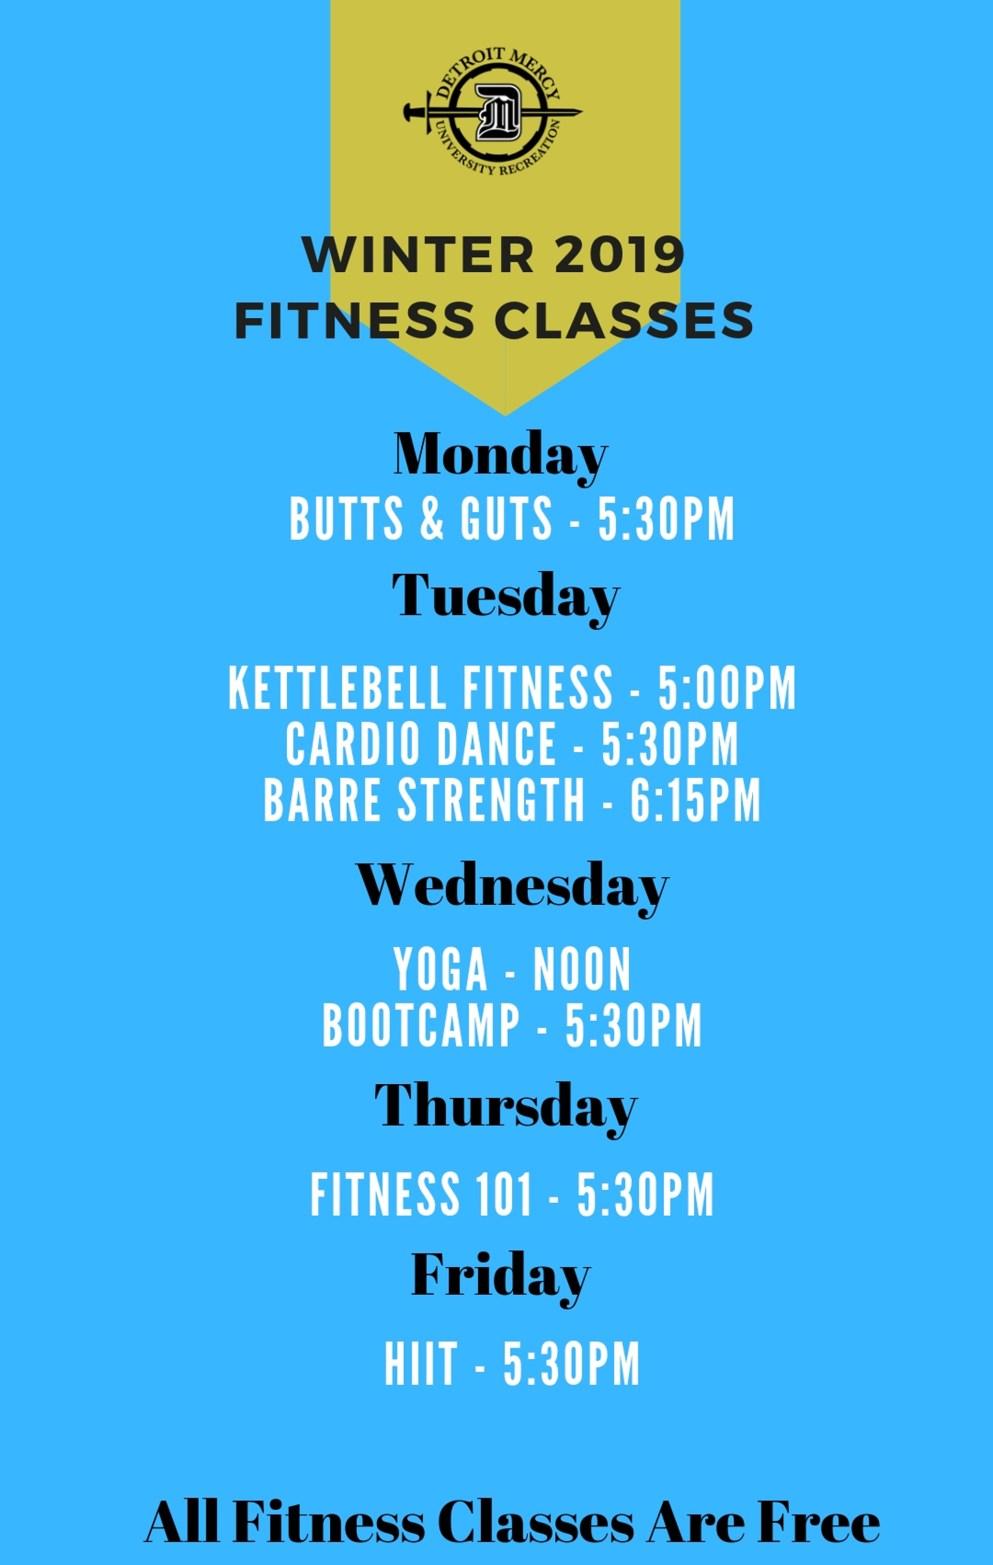 University Recreation Winter 2019 Fitness Classes